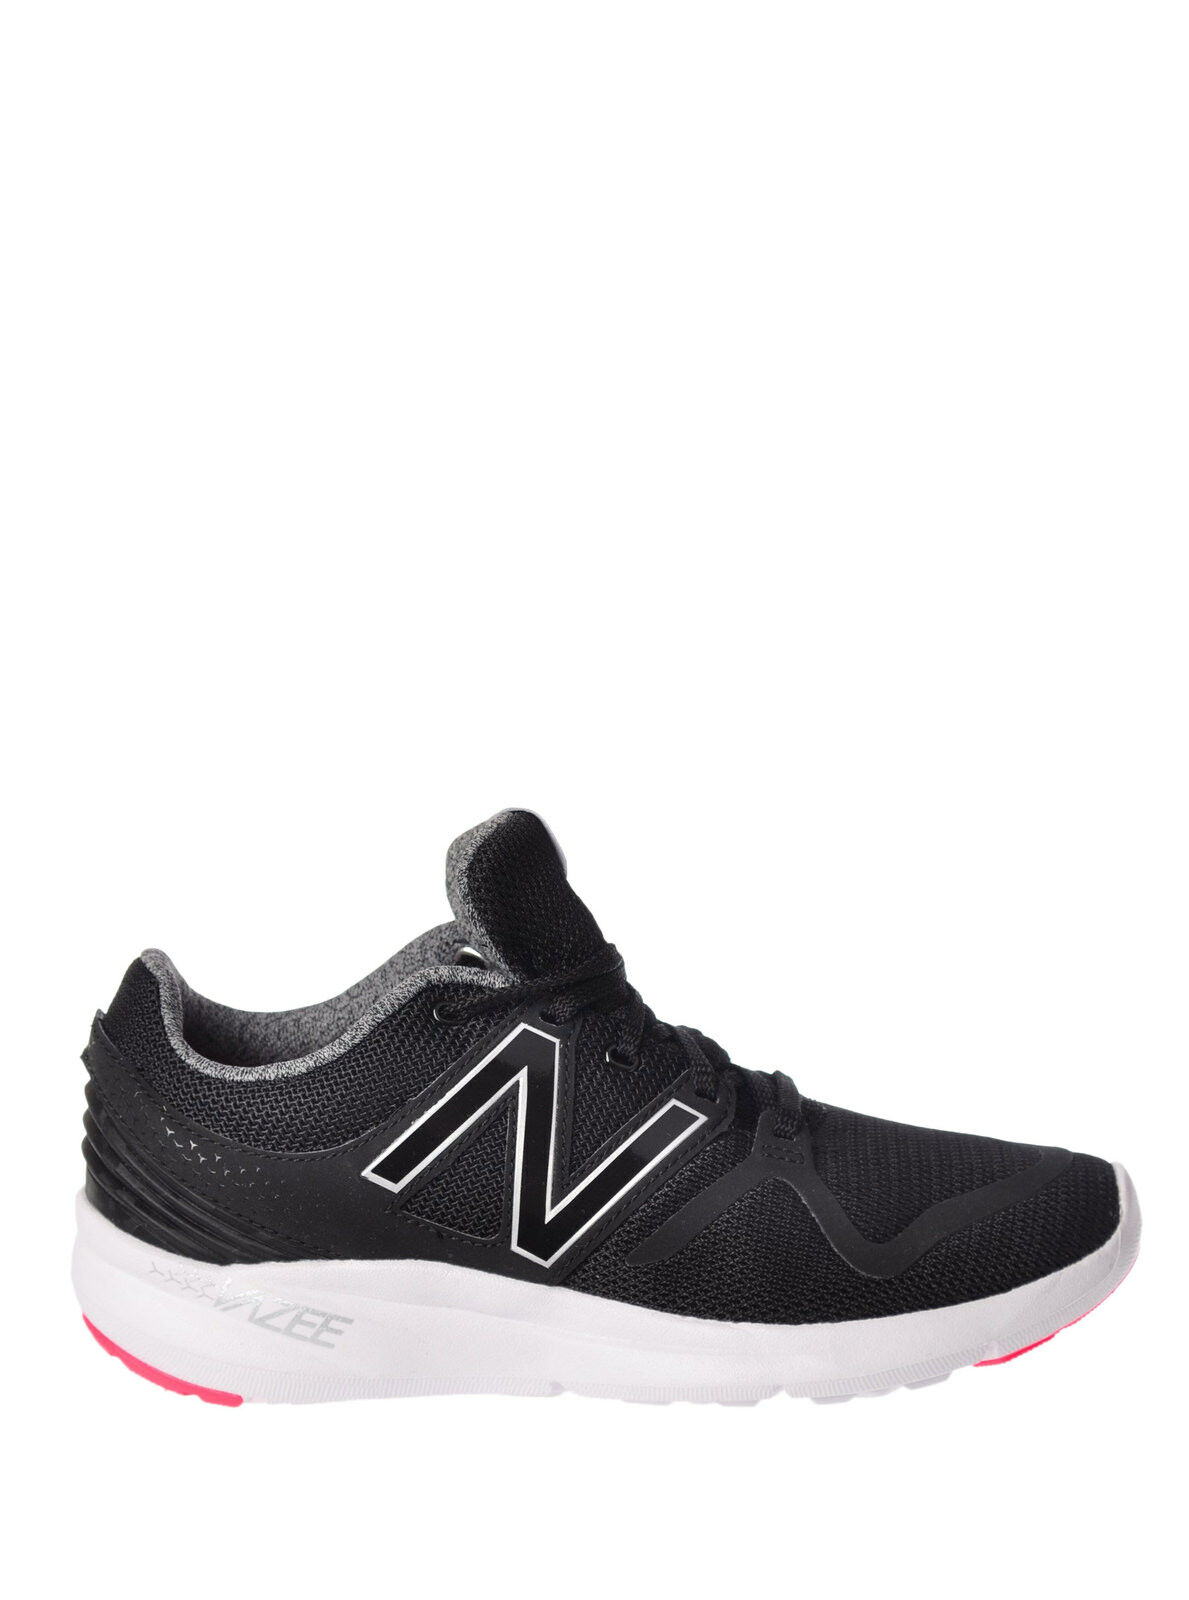 New Balance Balance Balance - zapatos-zapatilla de deporte-niedrige - Frau - negro - 455715C184724  calidad auténtica